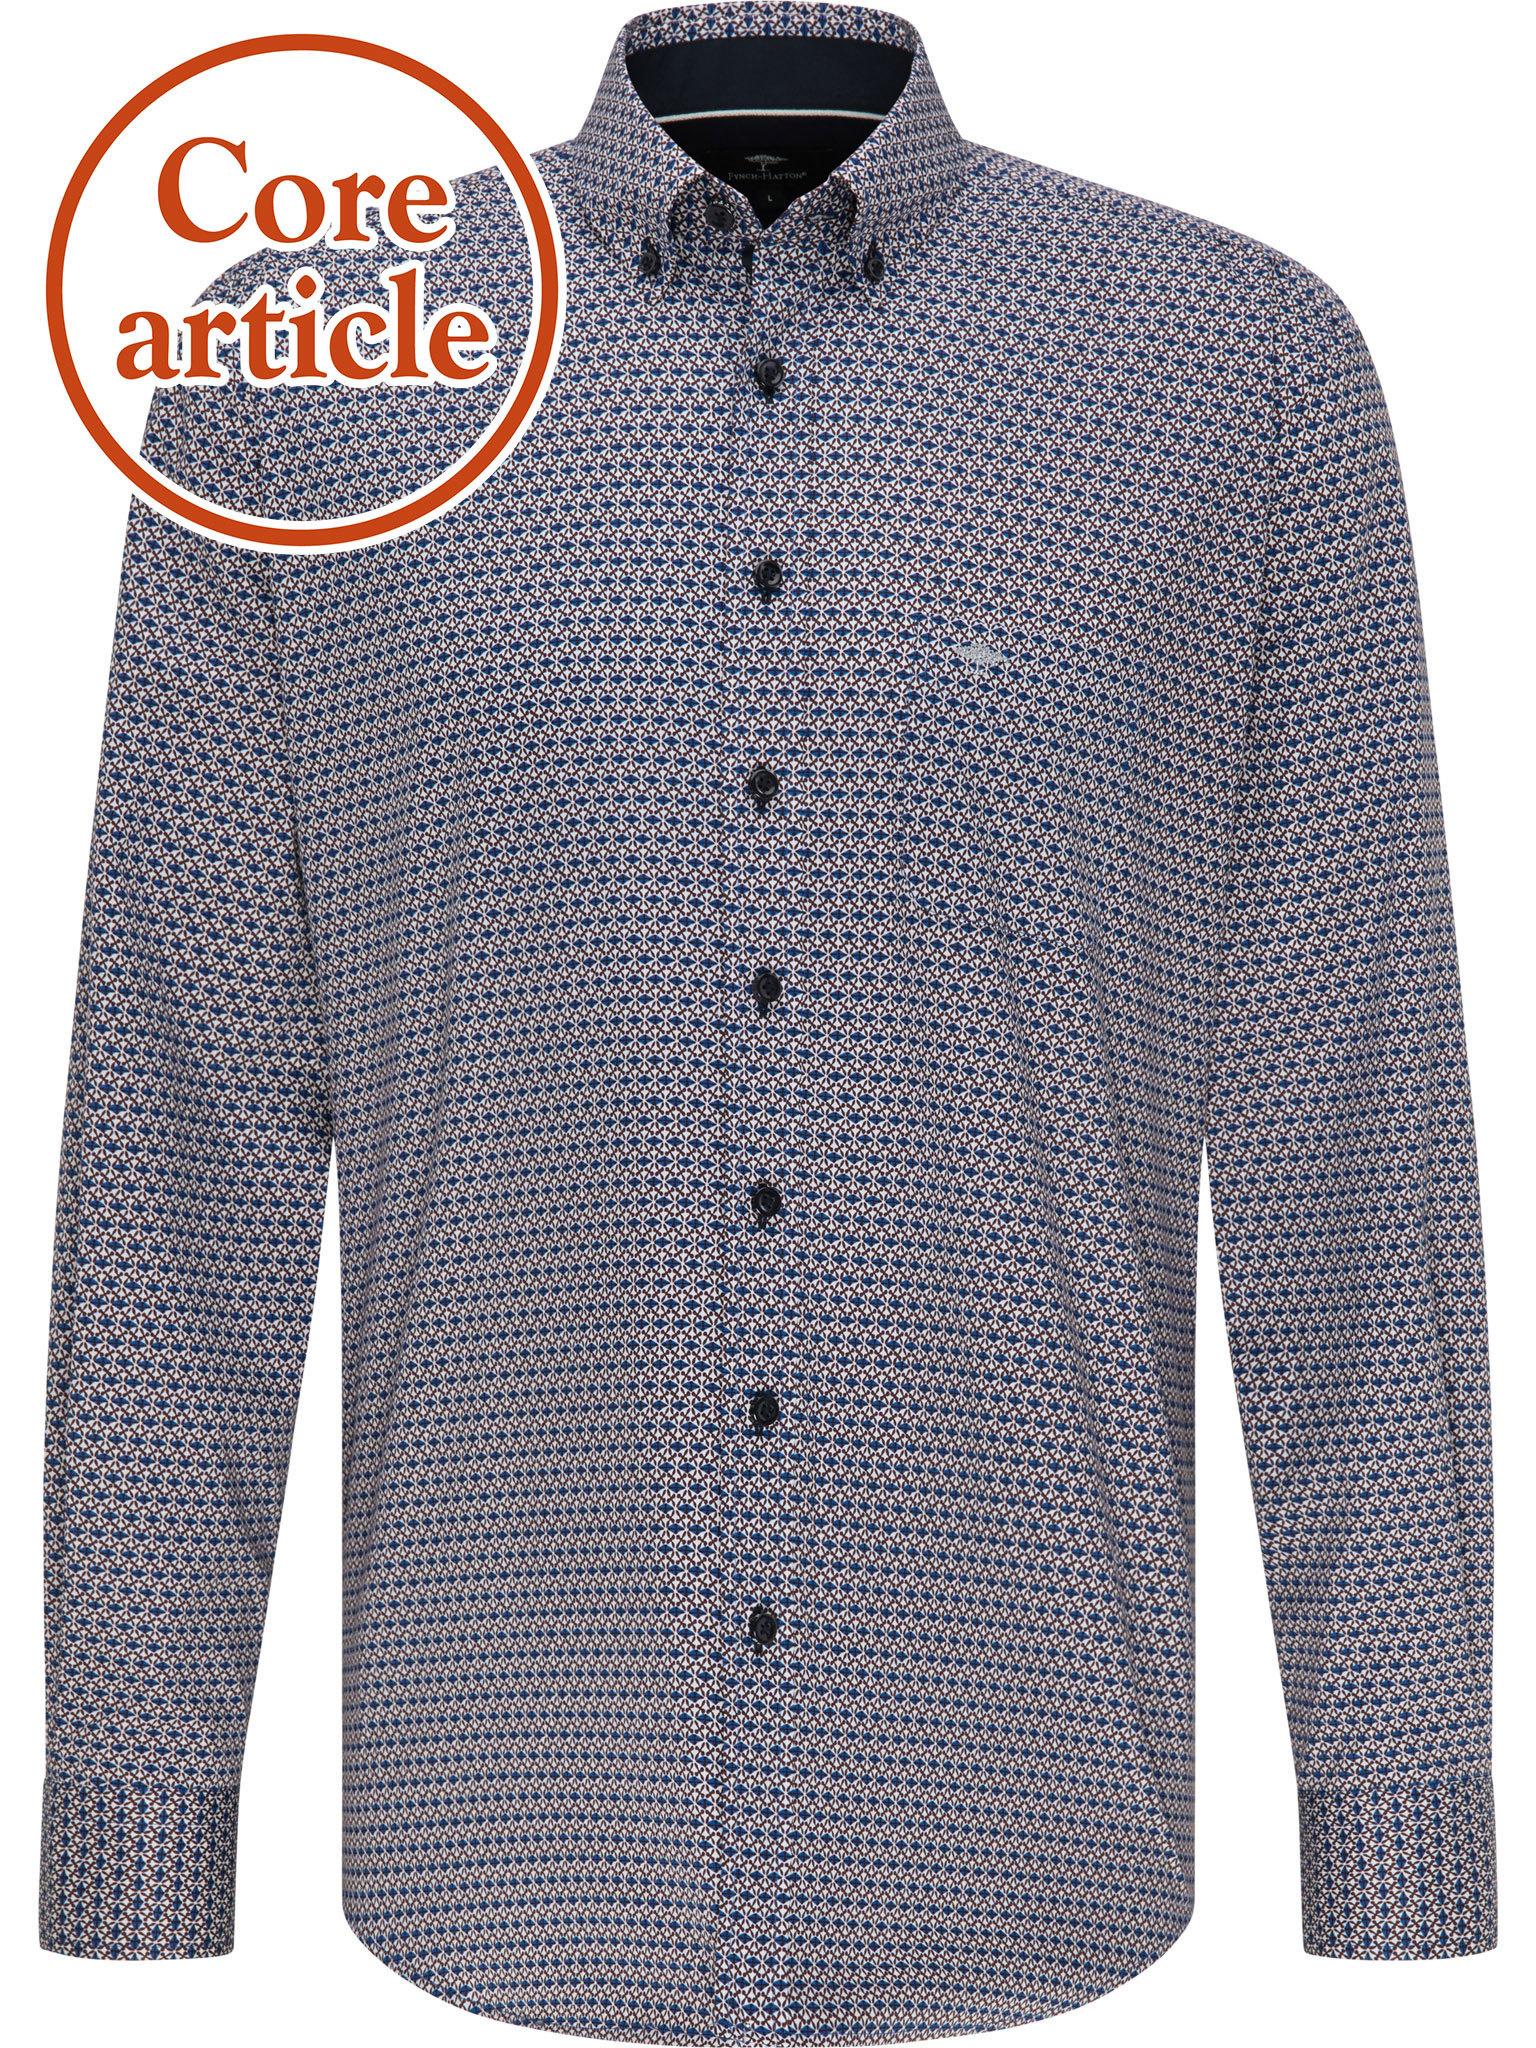 FYNCH HATTON chemise merlot blue print-1